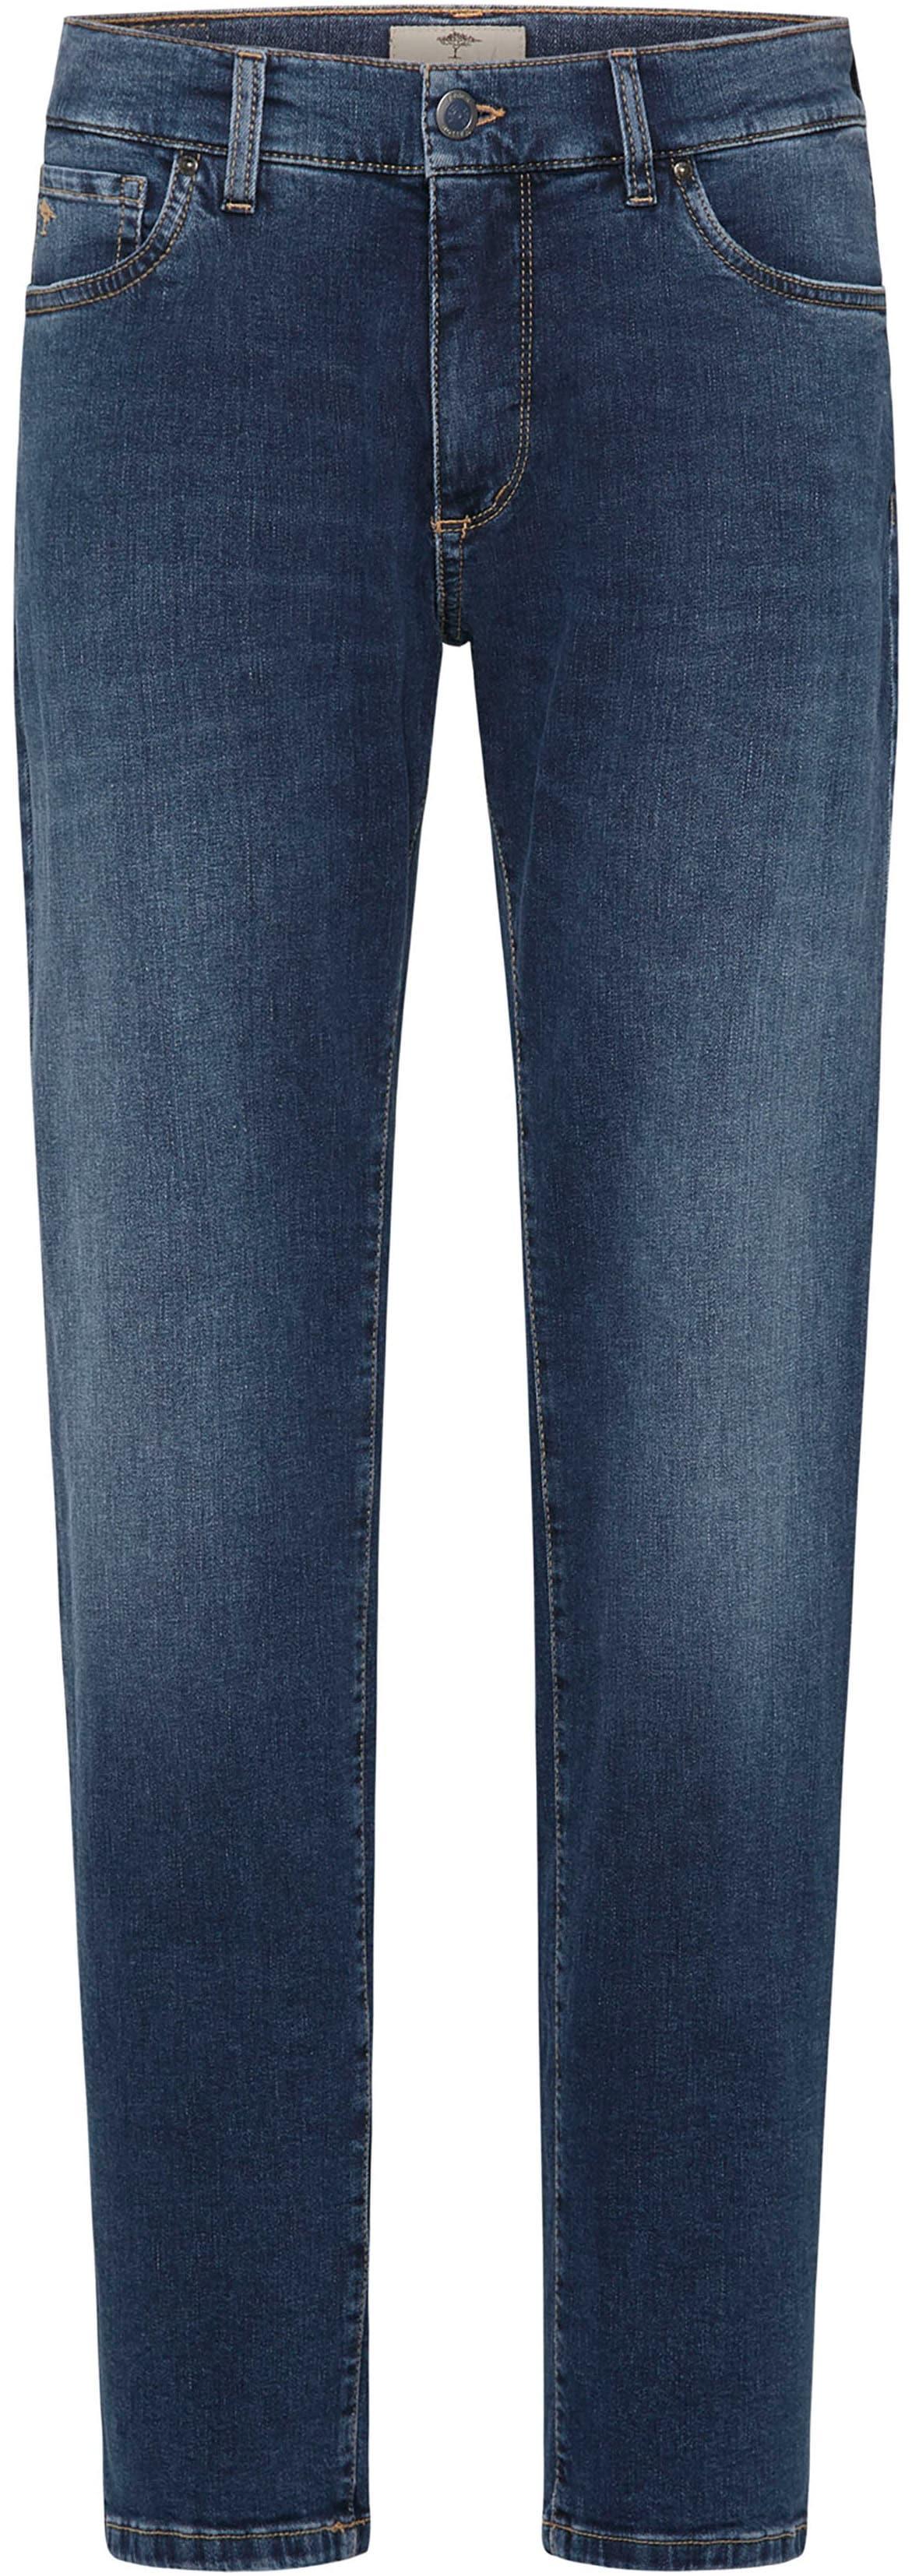 fynch-hatton -  5-Pocket-Jeans